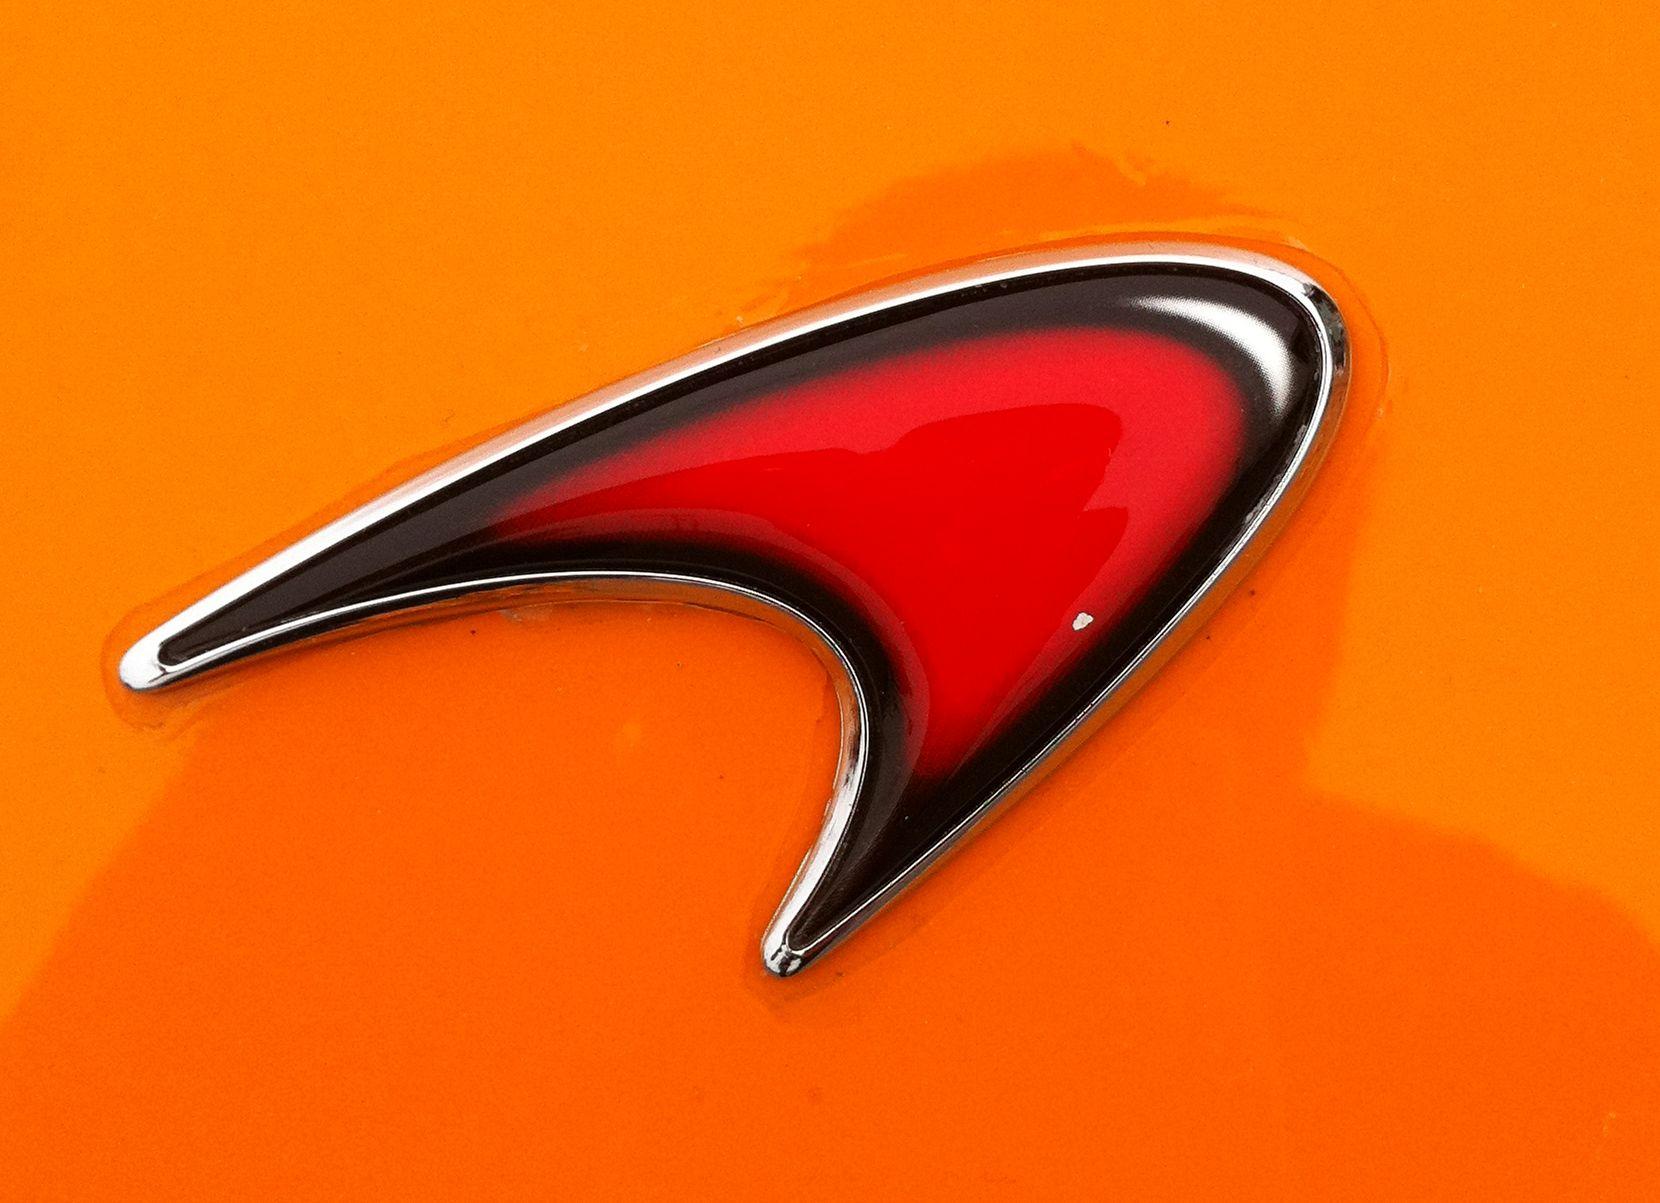 McLaren Symbol Wallpaper